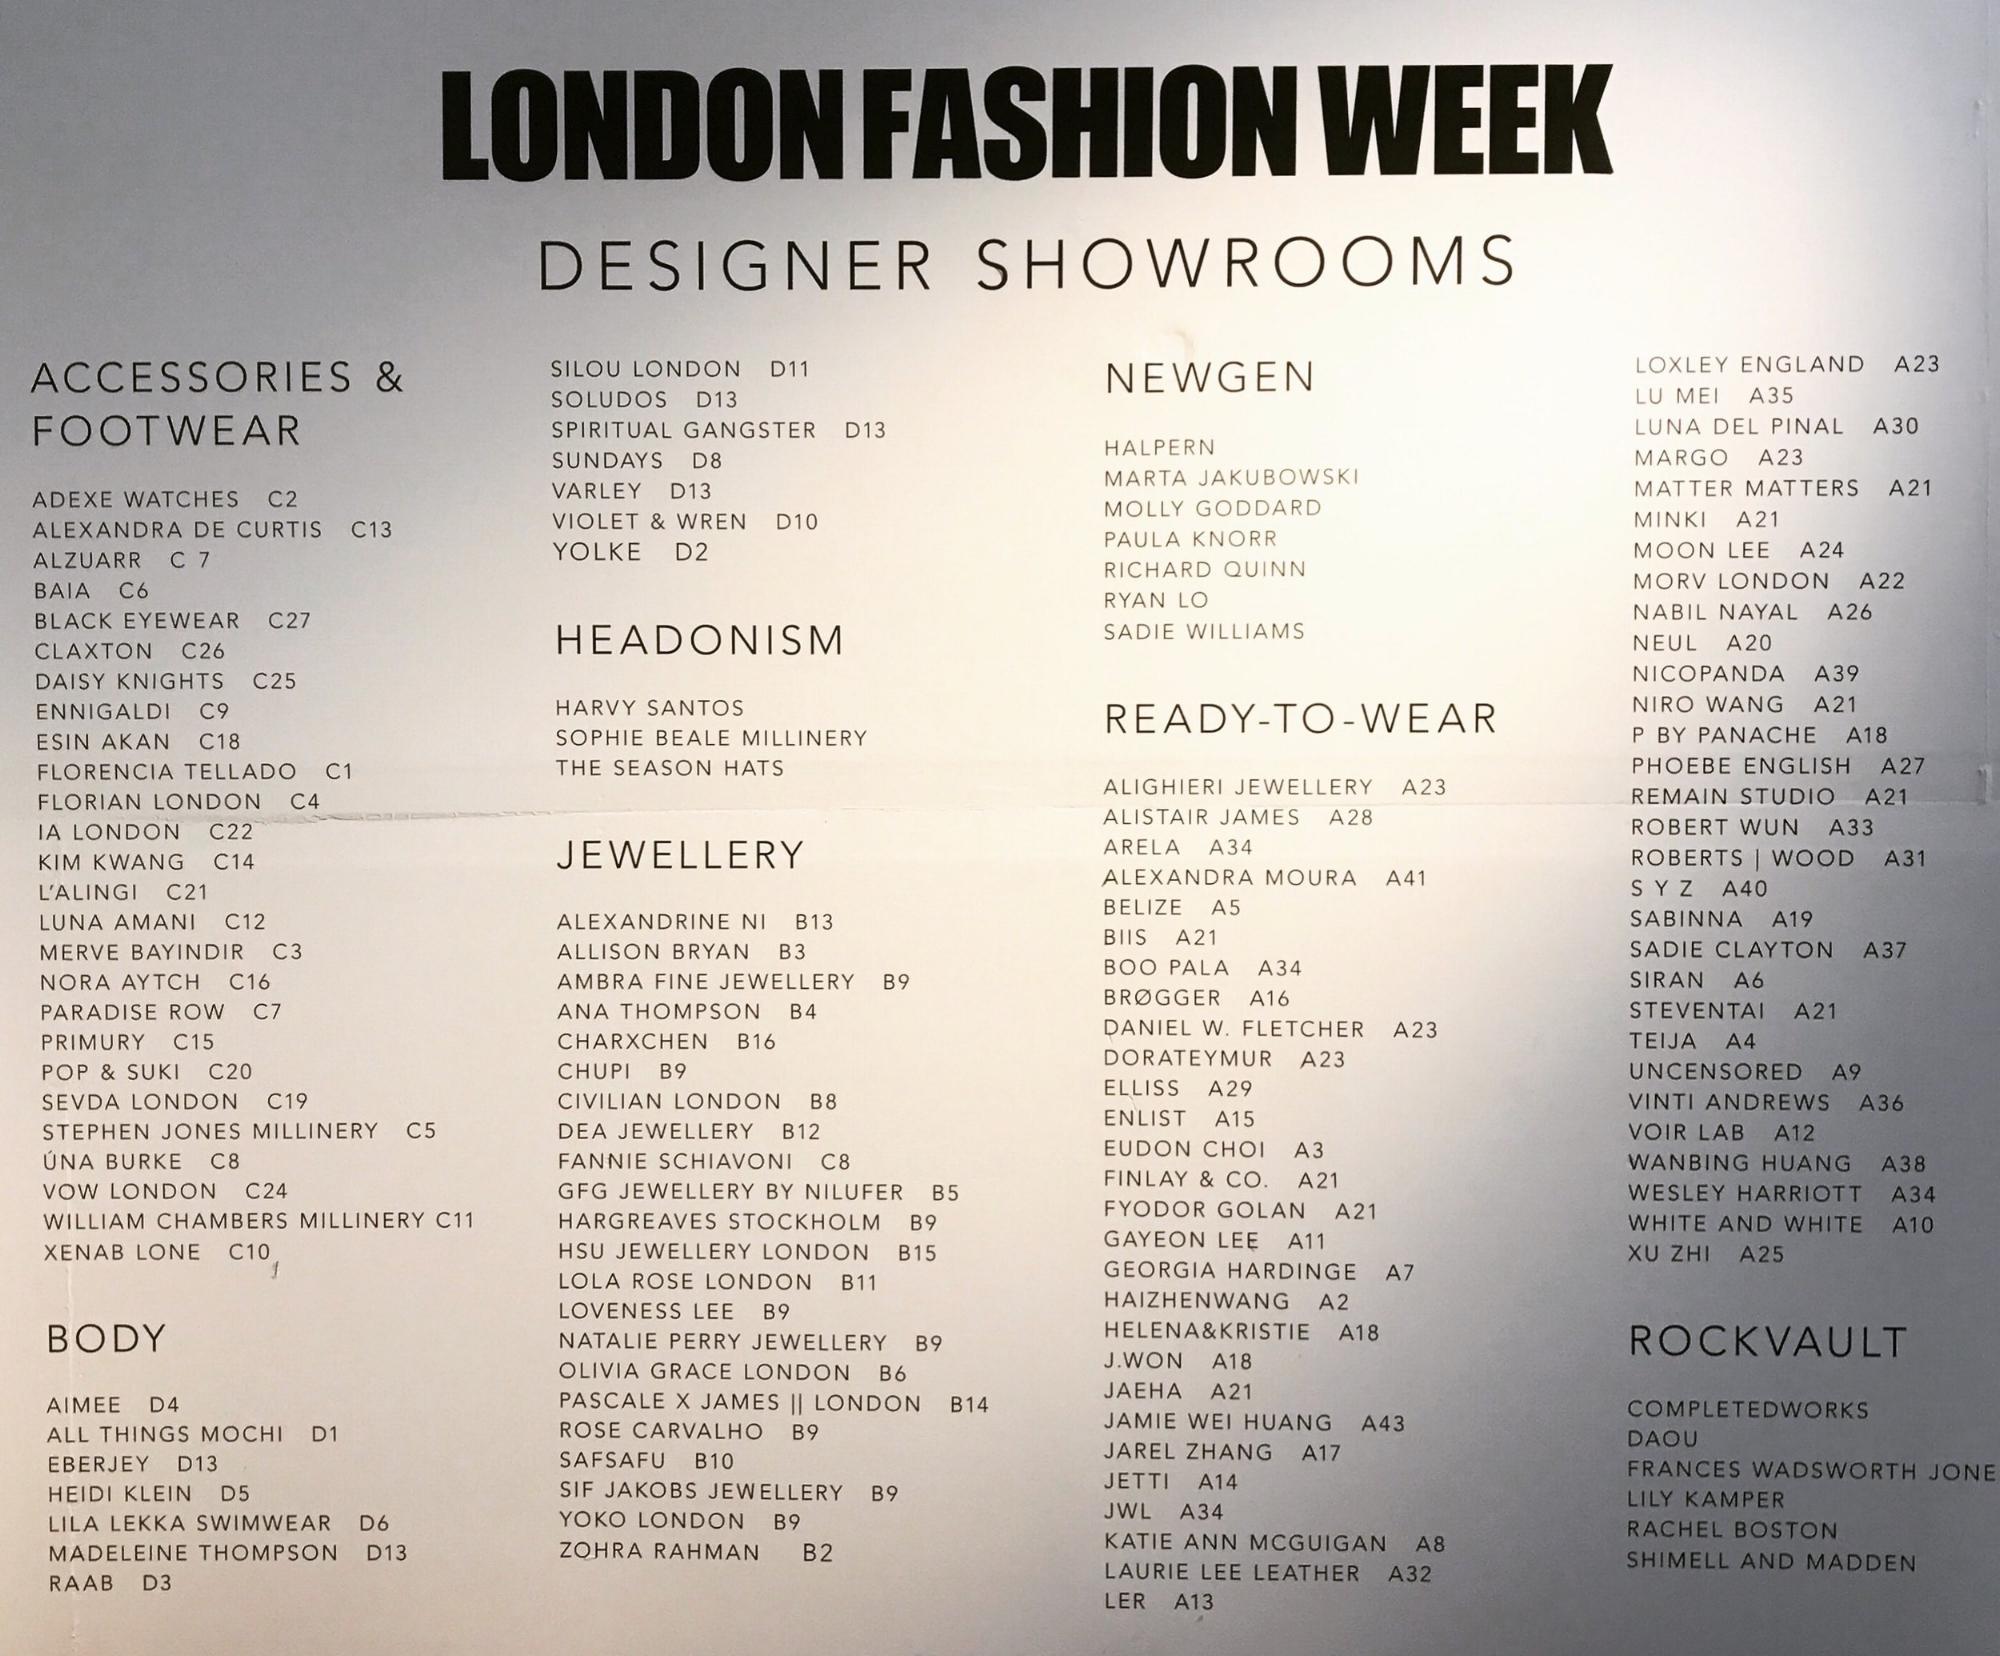 London Fashion Week S/S 18 participants